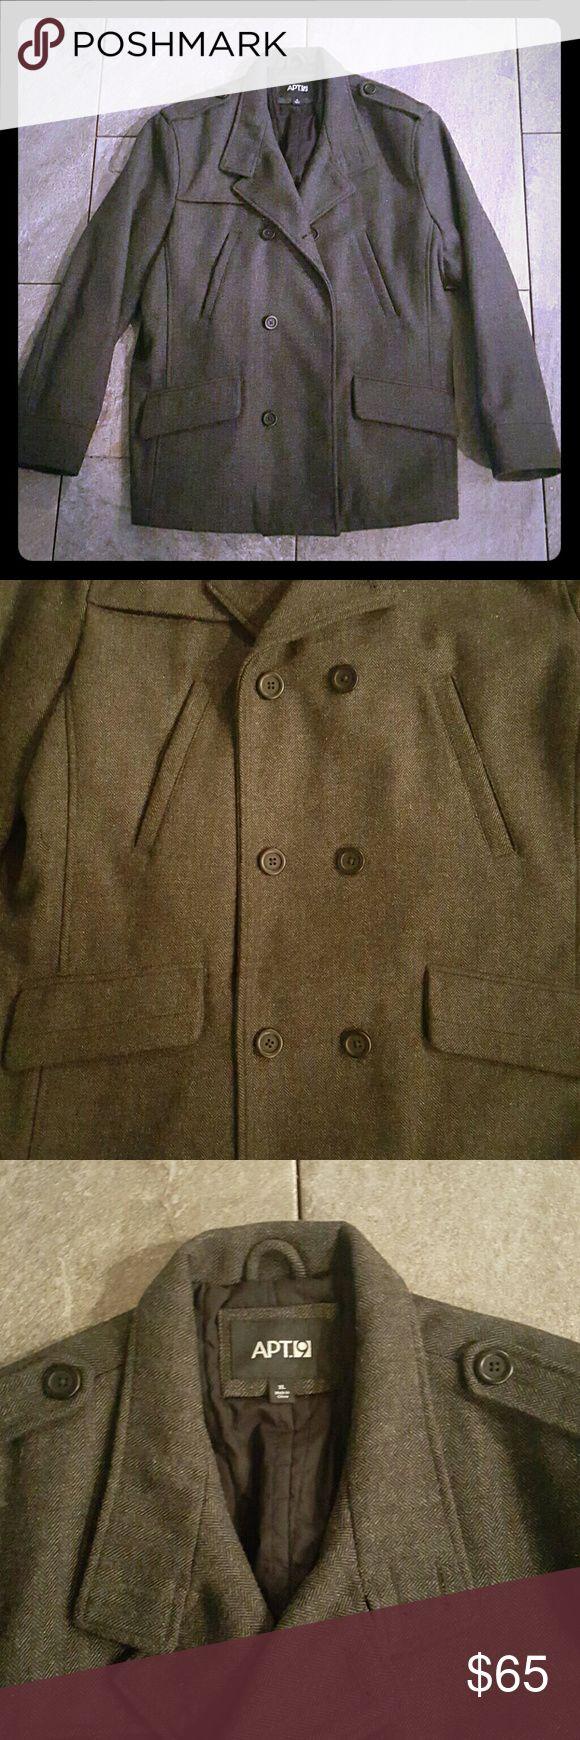 * REDUCED * Men's Dark Gray Pea Coat Men's Apt. 9 dark gray pea coat. XL. Worn once - excellent condition. Apt. 9 Jackets & Coats Pea Coats